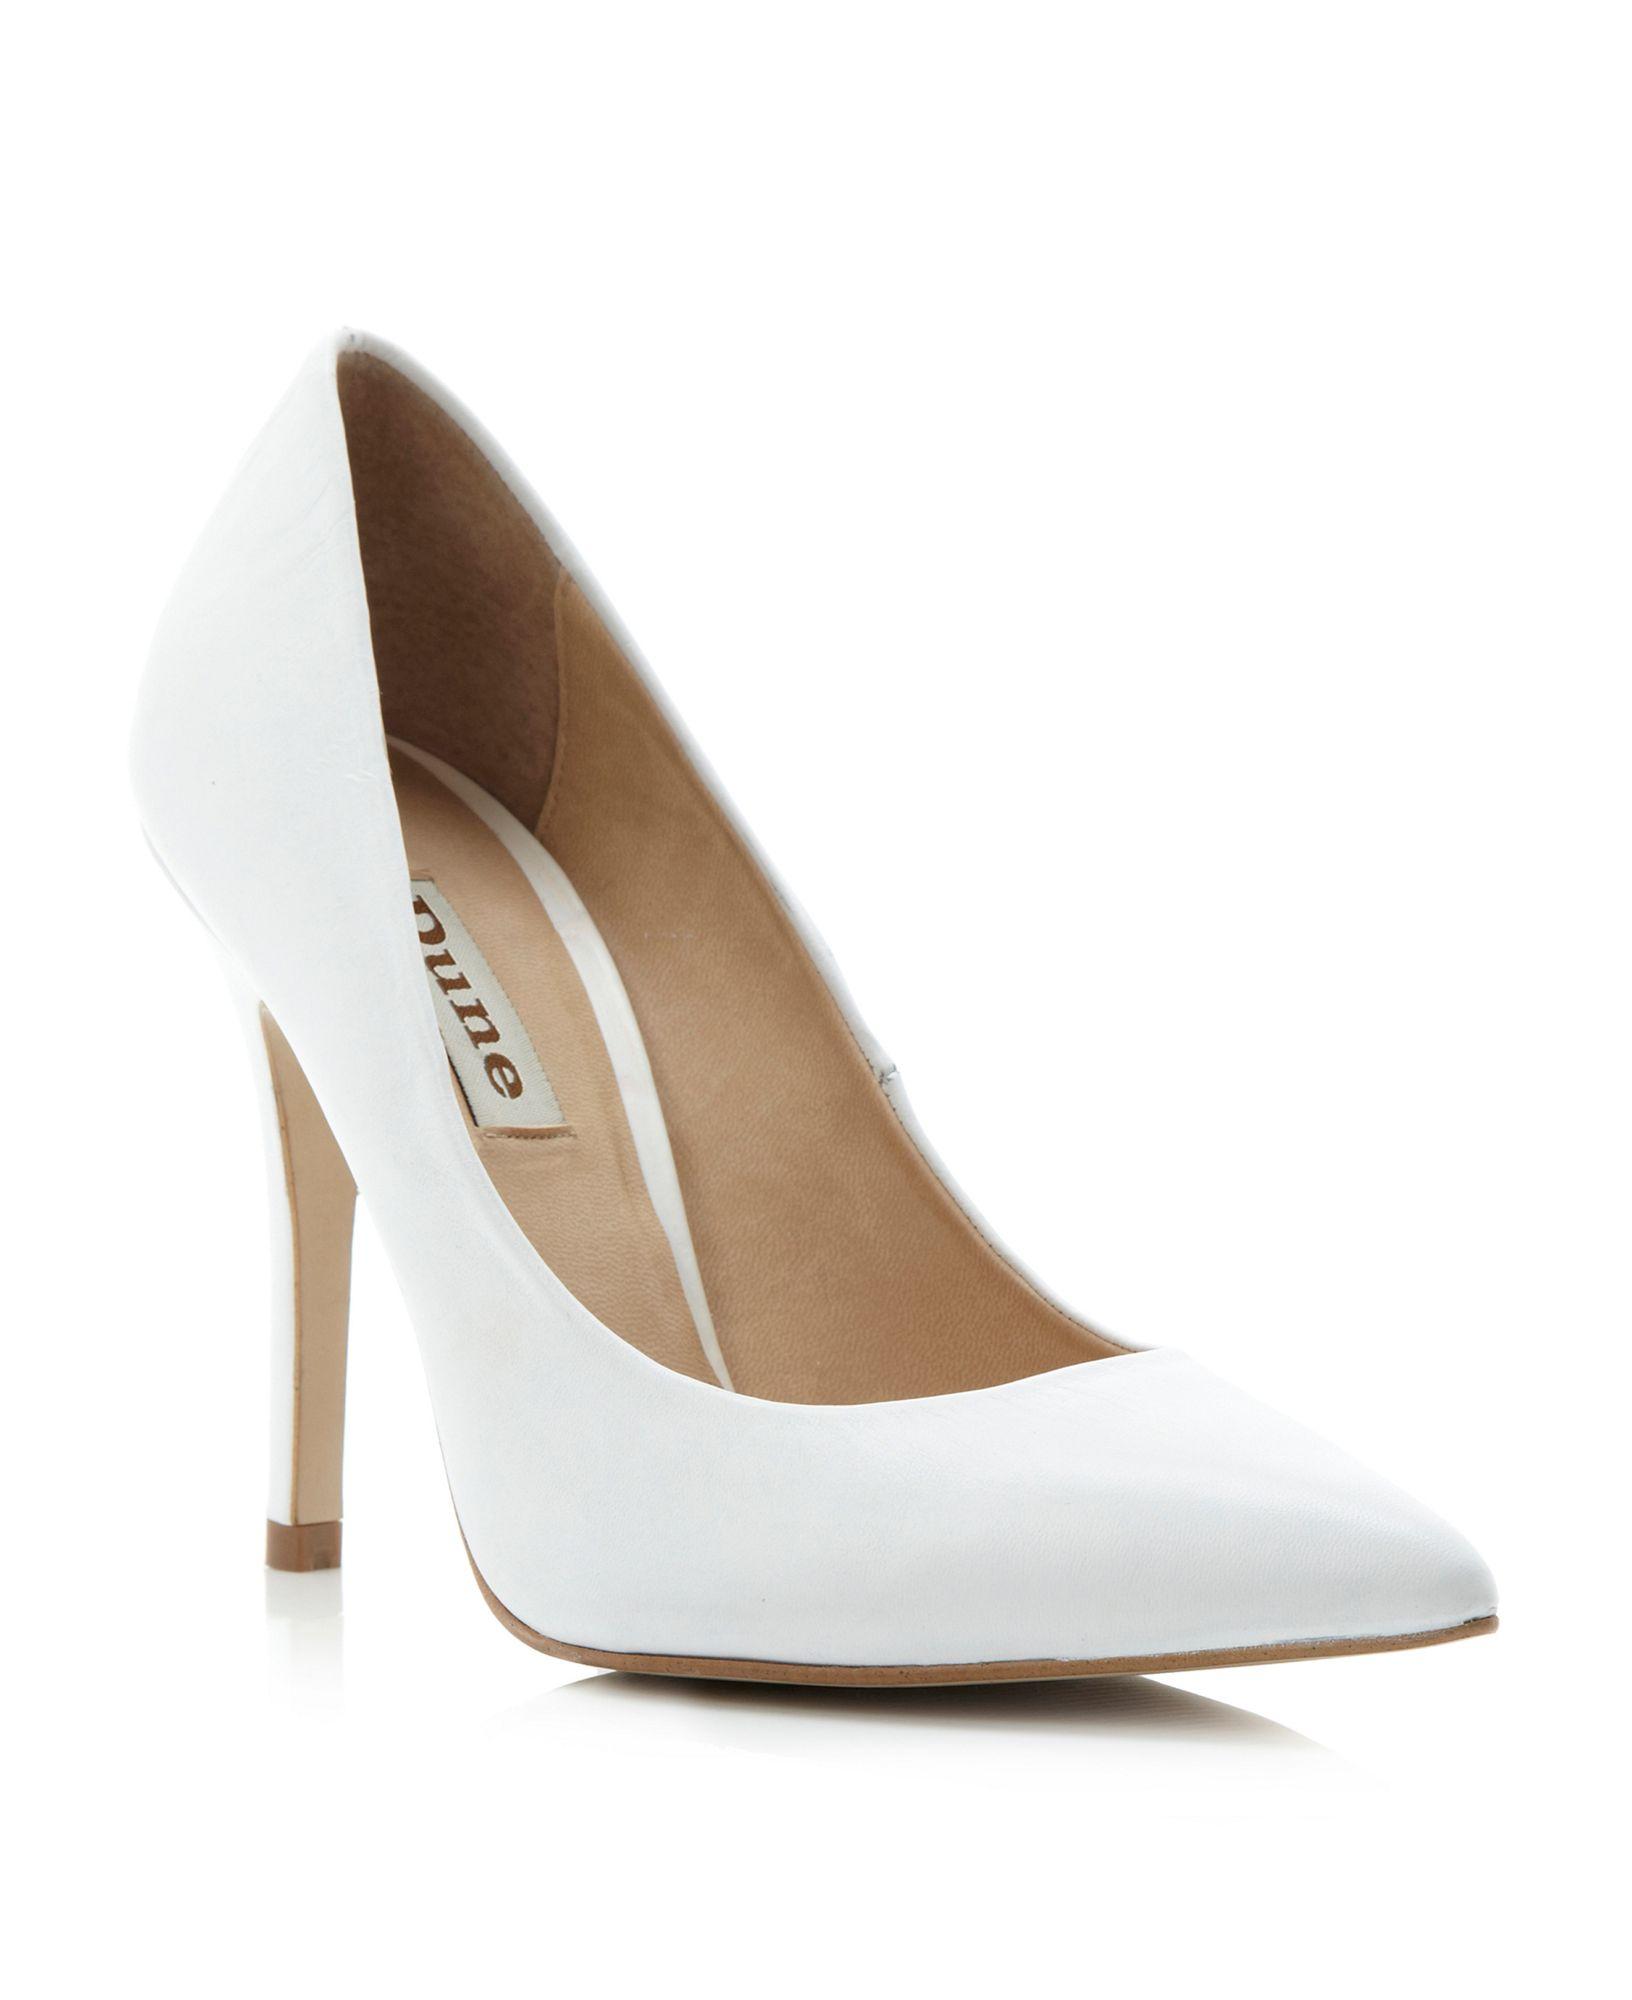 dune white shoes where can i buy 489e5